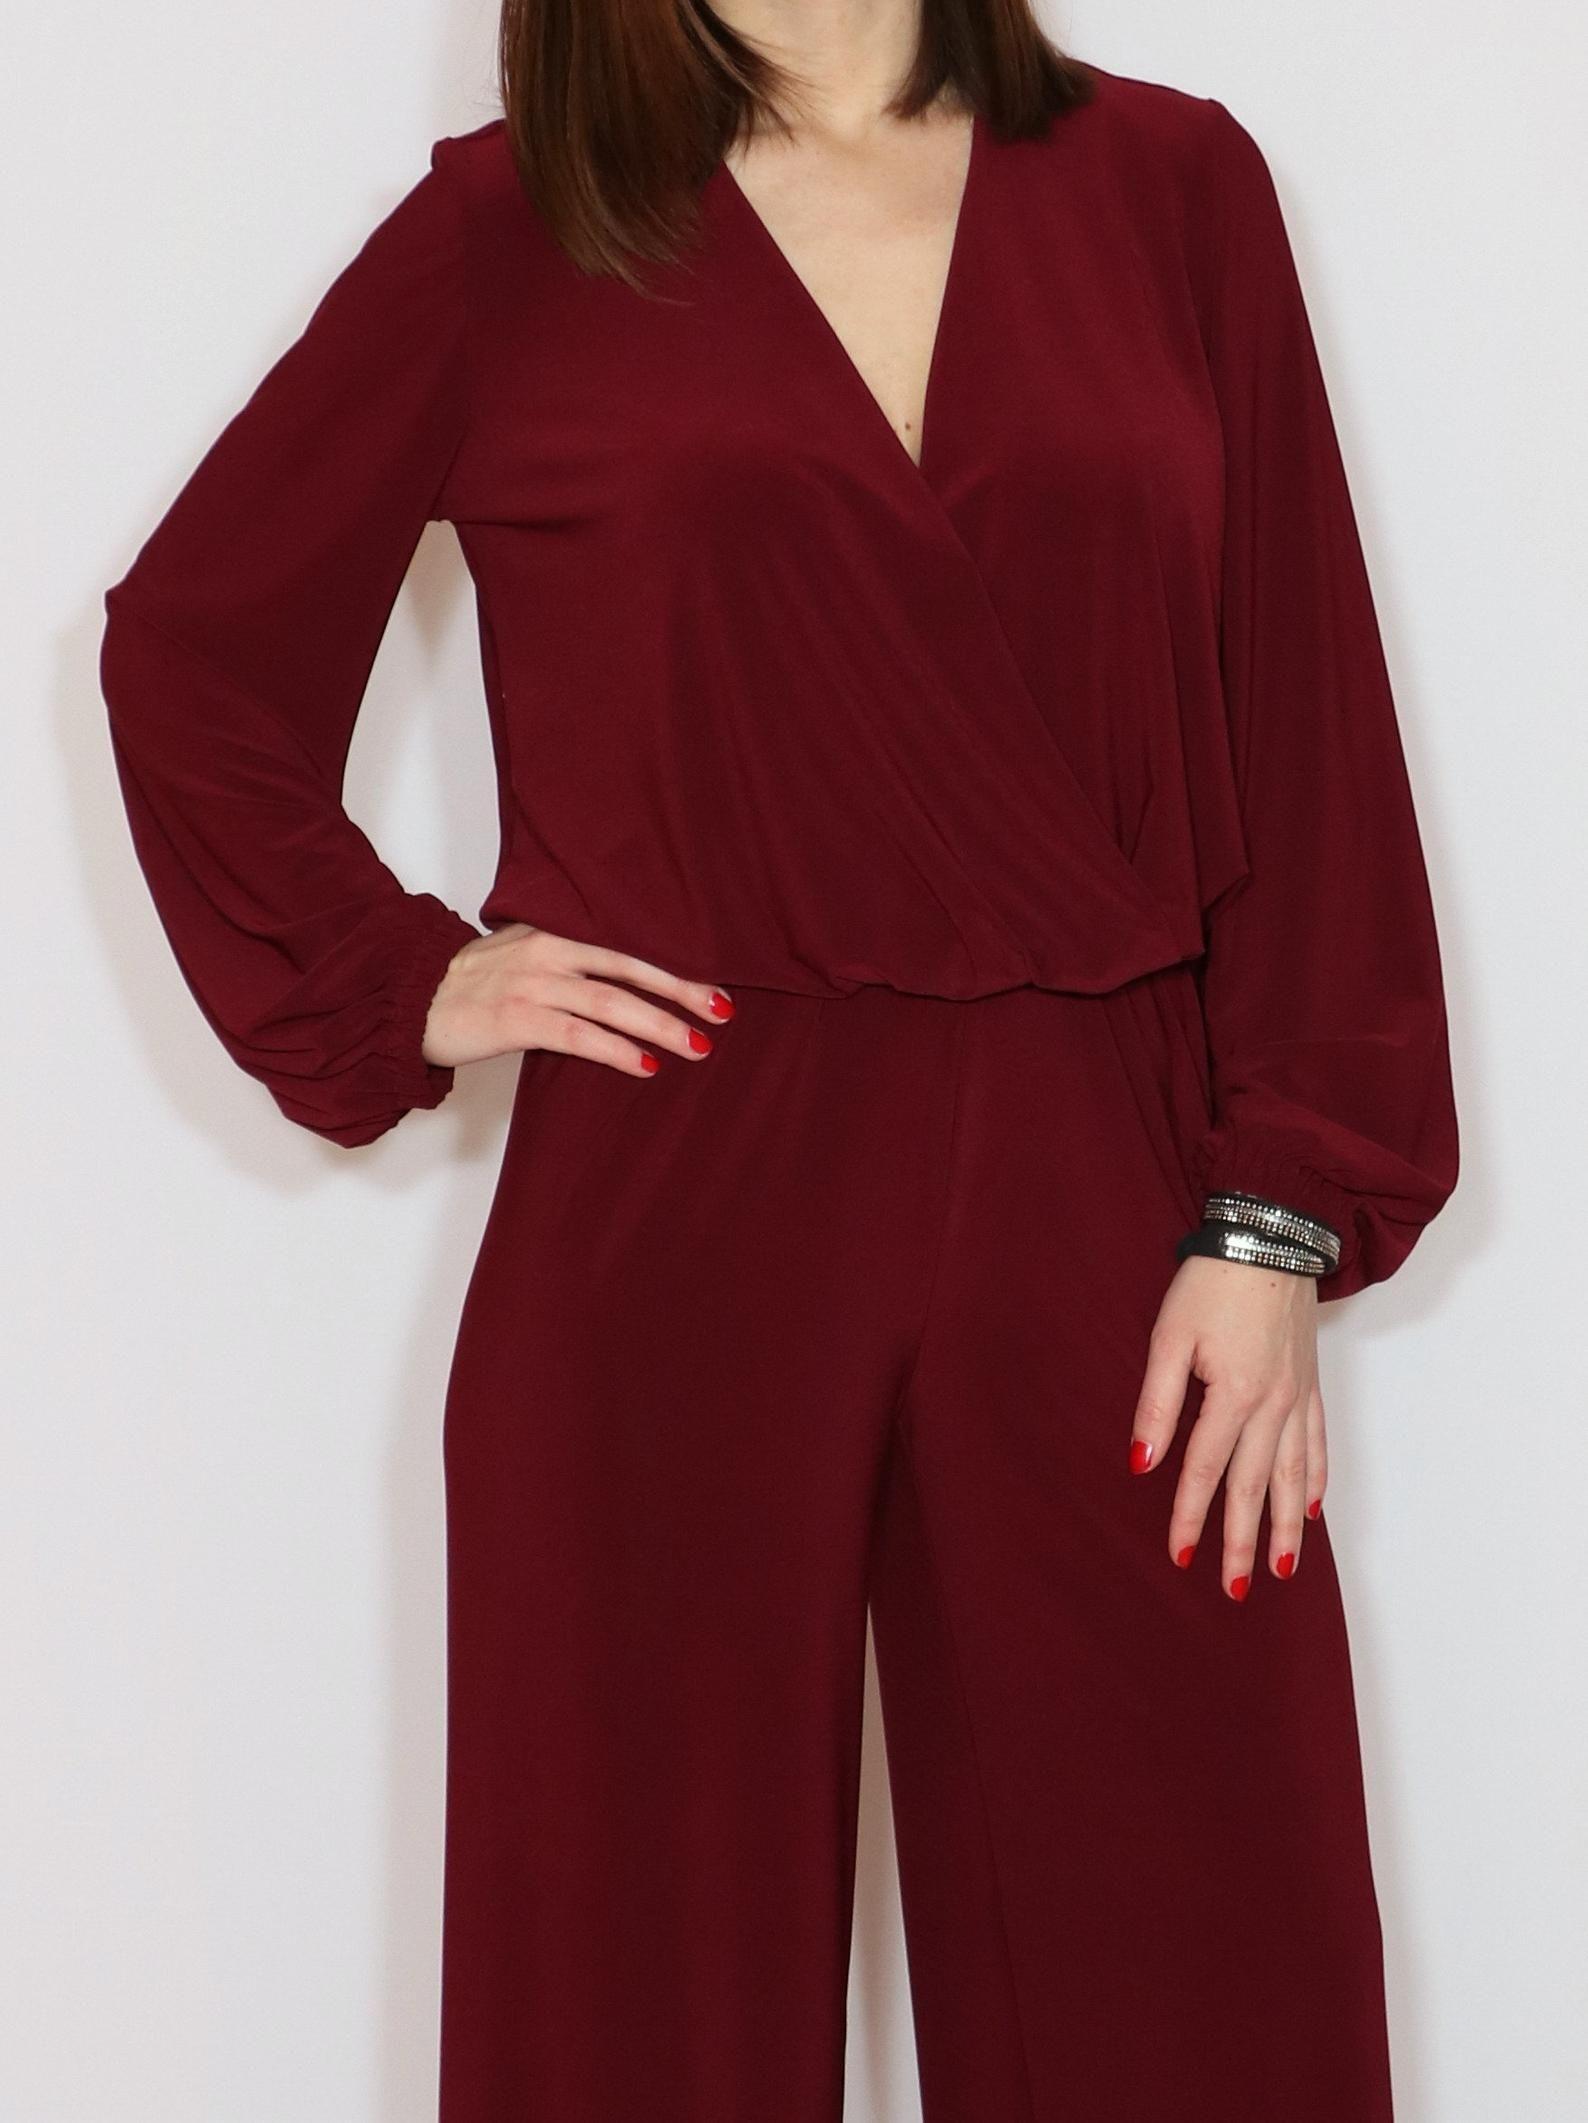 Burgundy Jumpsuit Women Wine Red Long Sleeve Jumpsuit Wide Etsy Burgundy Long Sleeve Jumpsuit Jumpsuits For Women Long Sleeve Jumpsuit